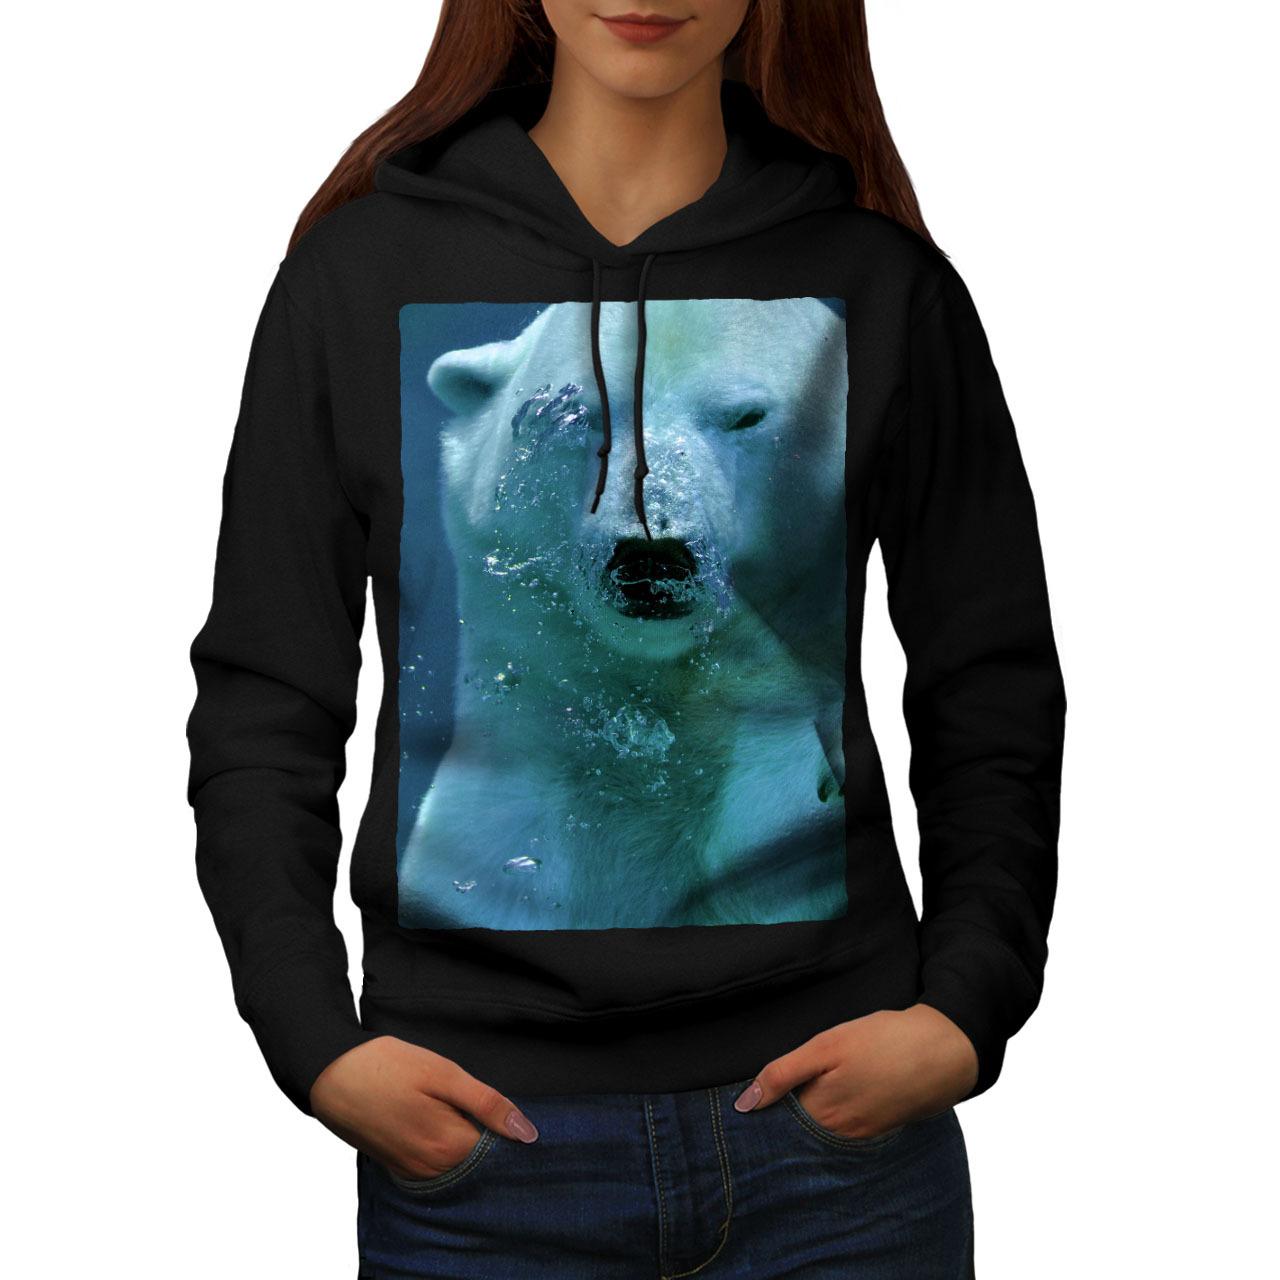 Polar Bear Water Animal Sweatshirt Hoody White Cold Women Hoodie - $21.99 - $22.99